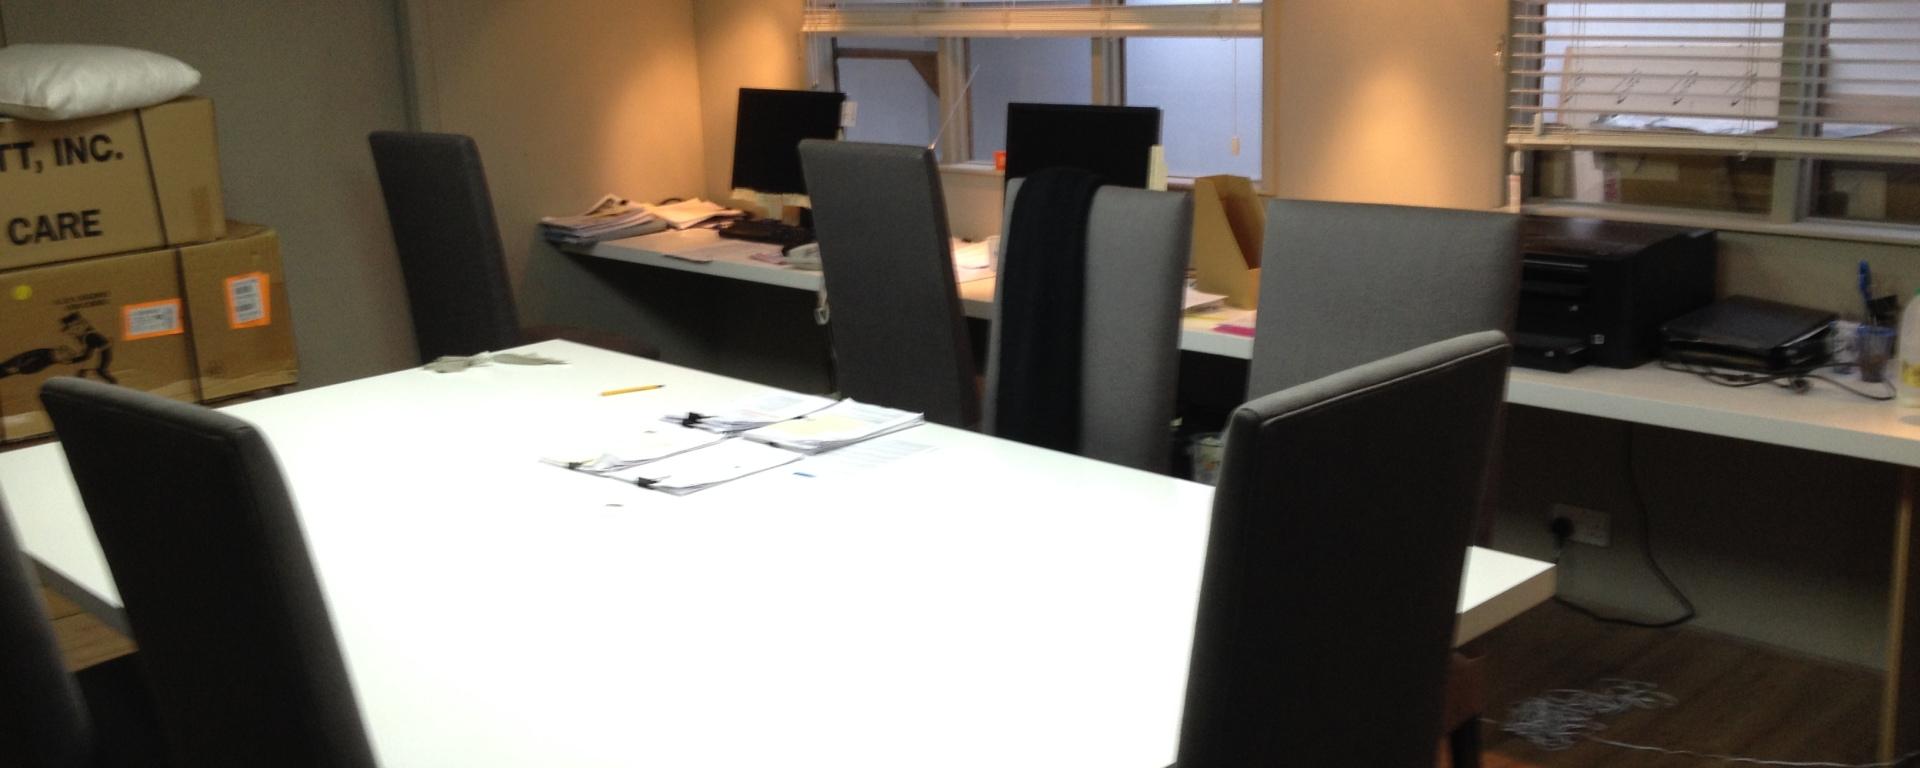 Bray Design Upholstery Furniture Room